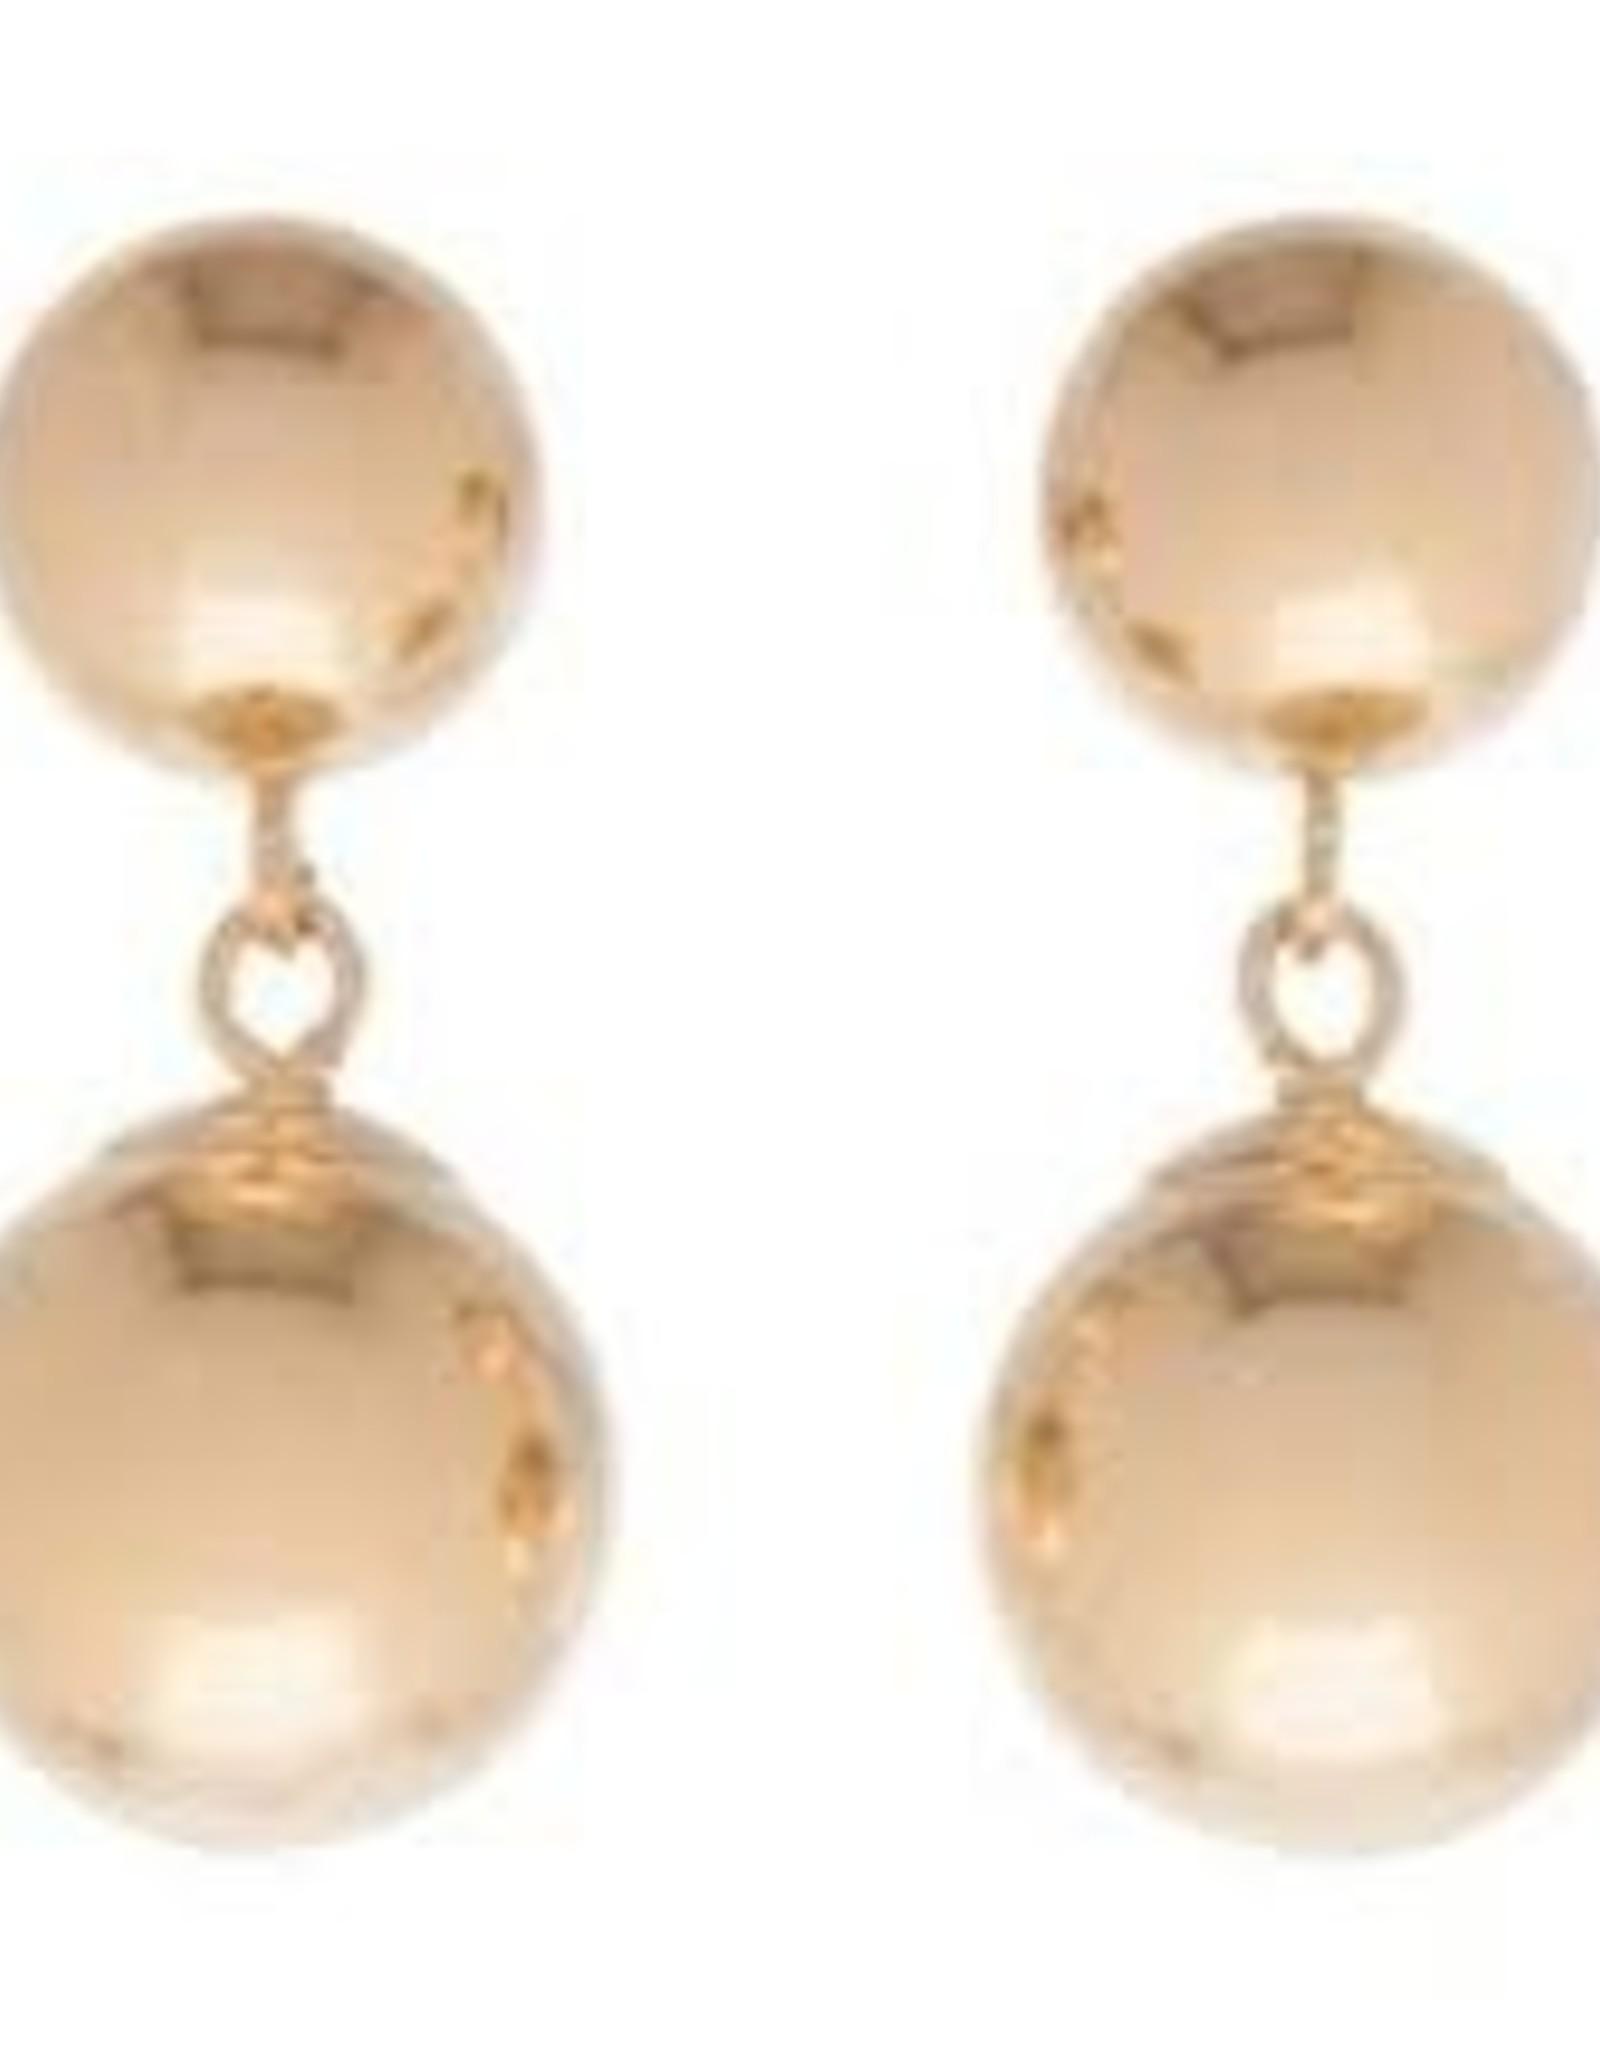 e.newton Clarity Stud Double Drop Gold